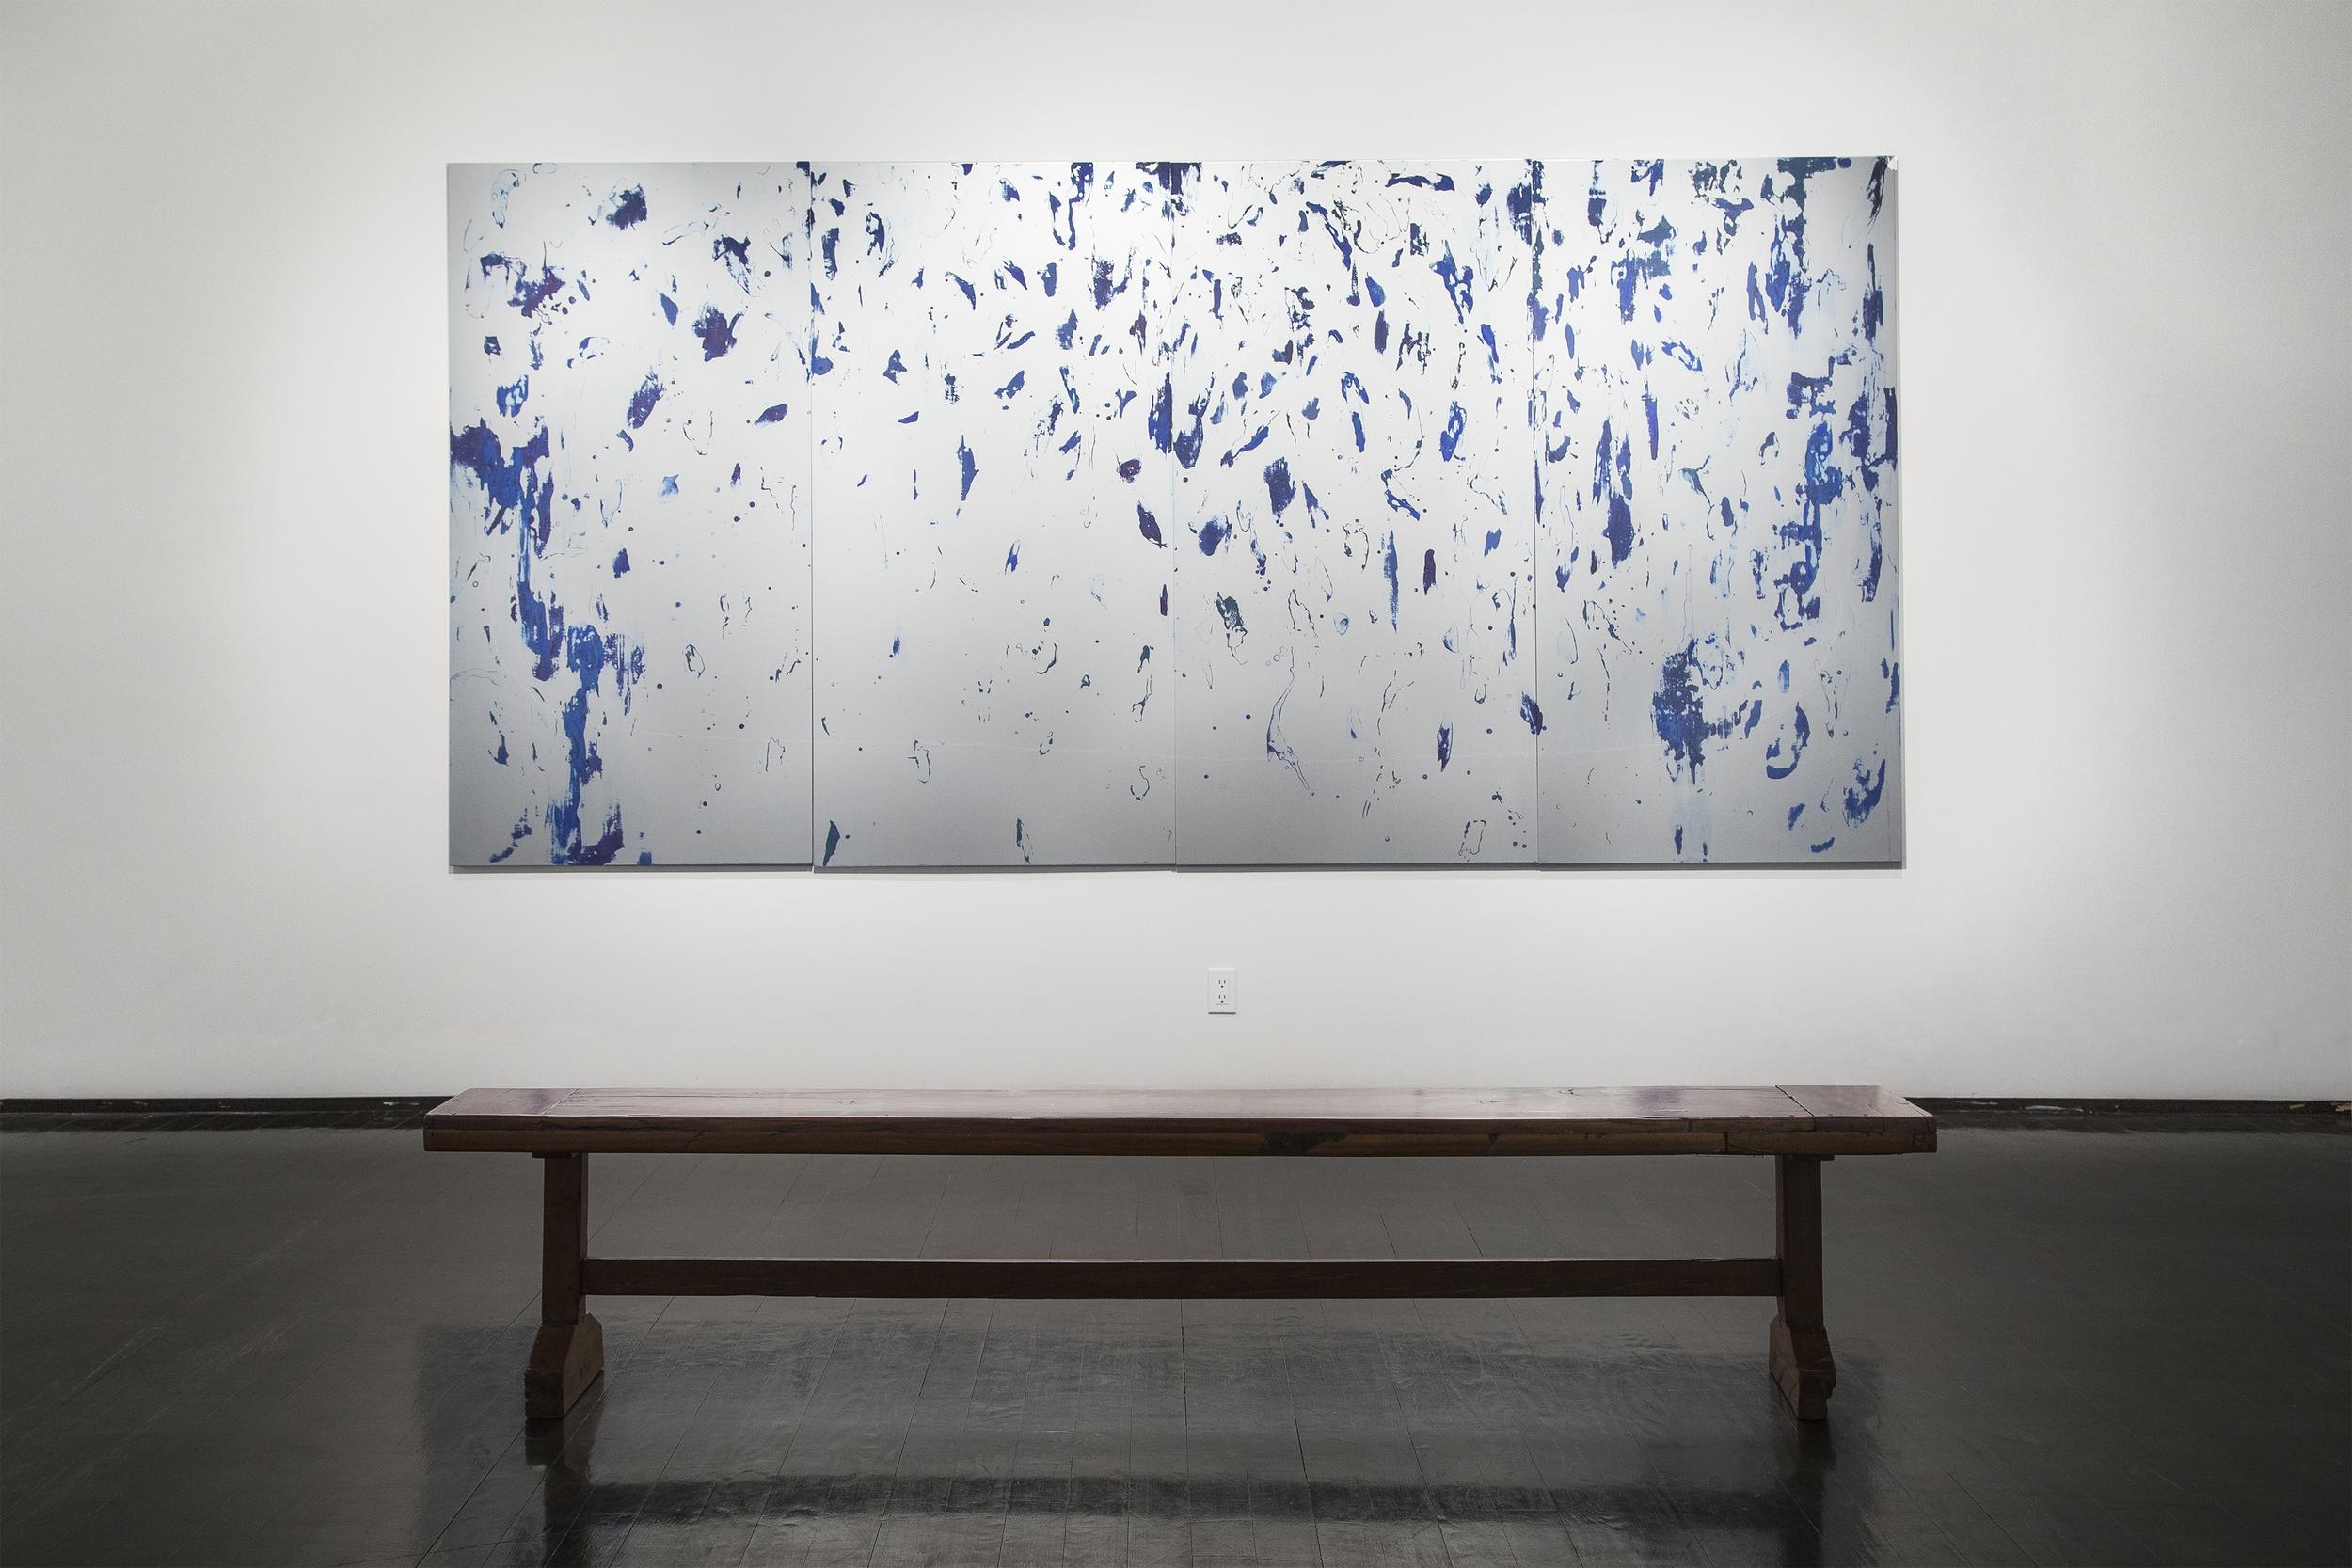 Dillon_Gallery_Yuzu_Ono_Exhibit_Chelsea_NYC.jpg